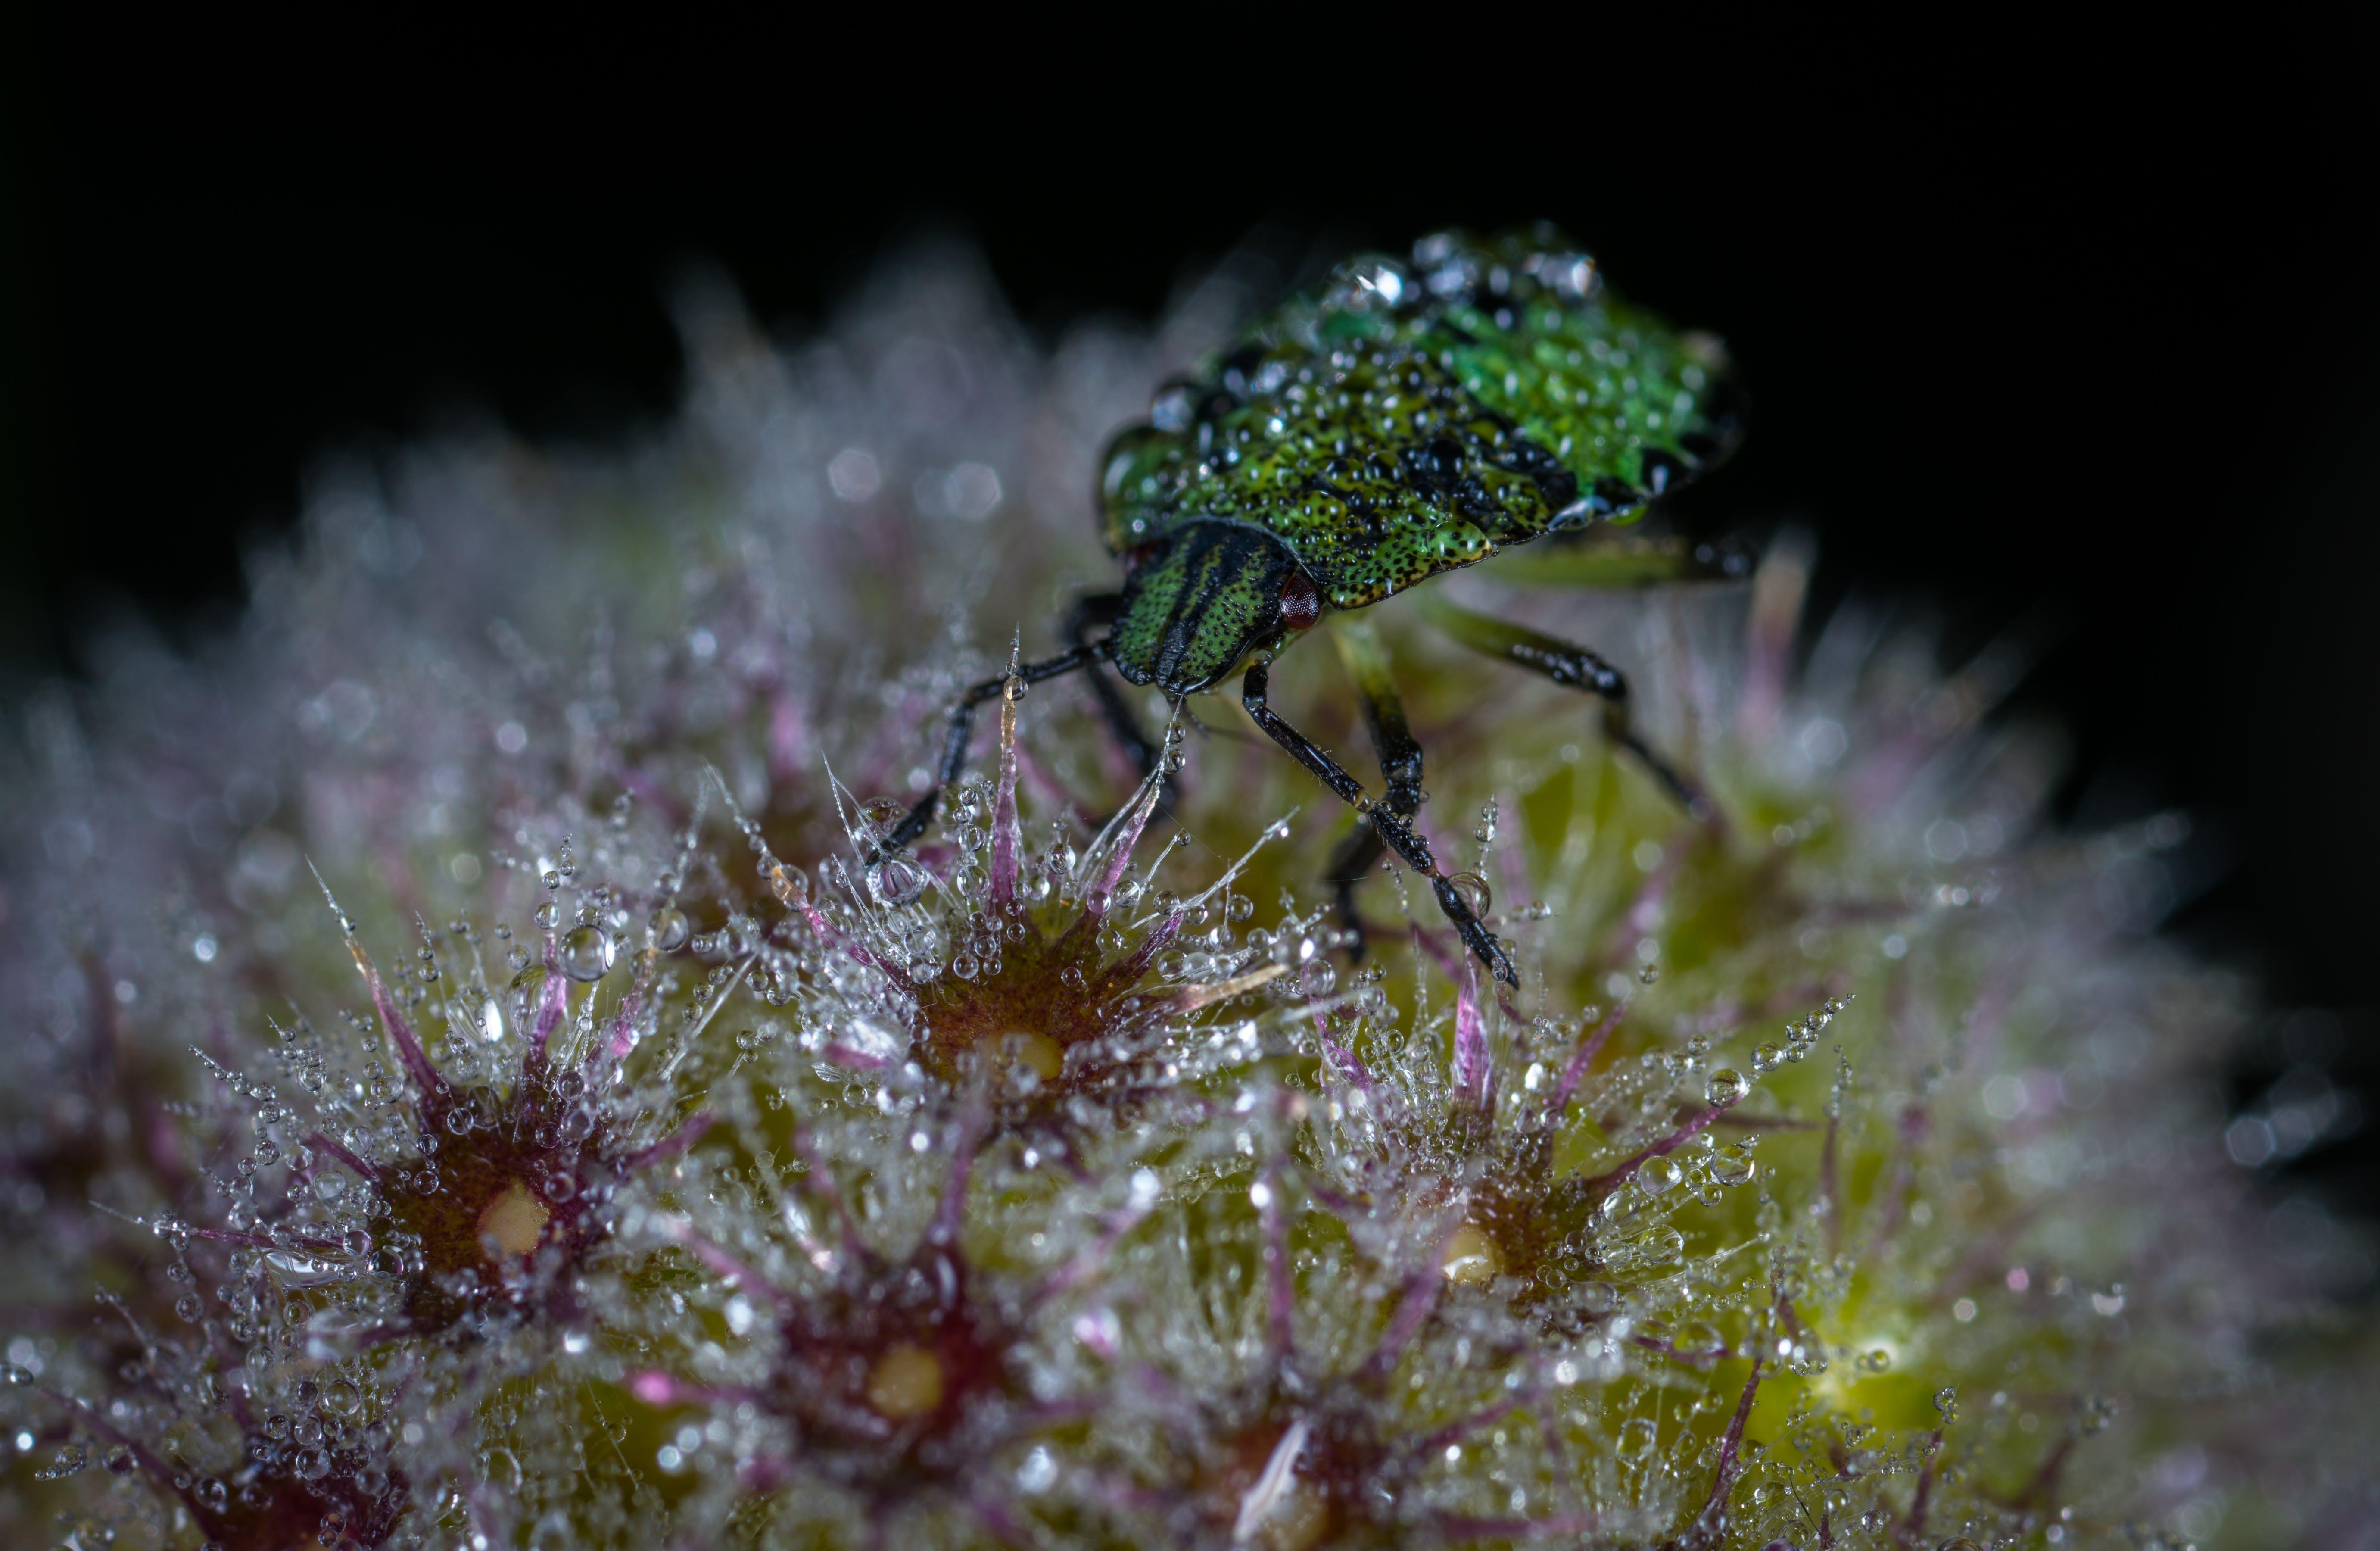 biologi, blomst, close-up